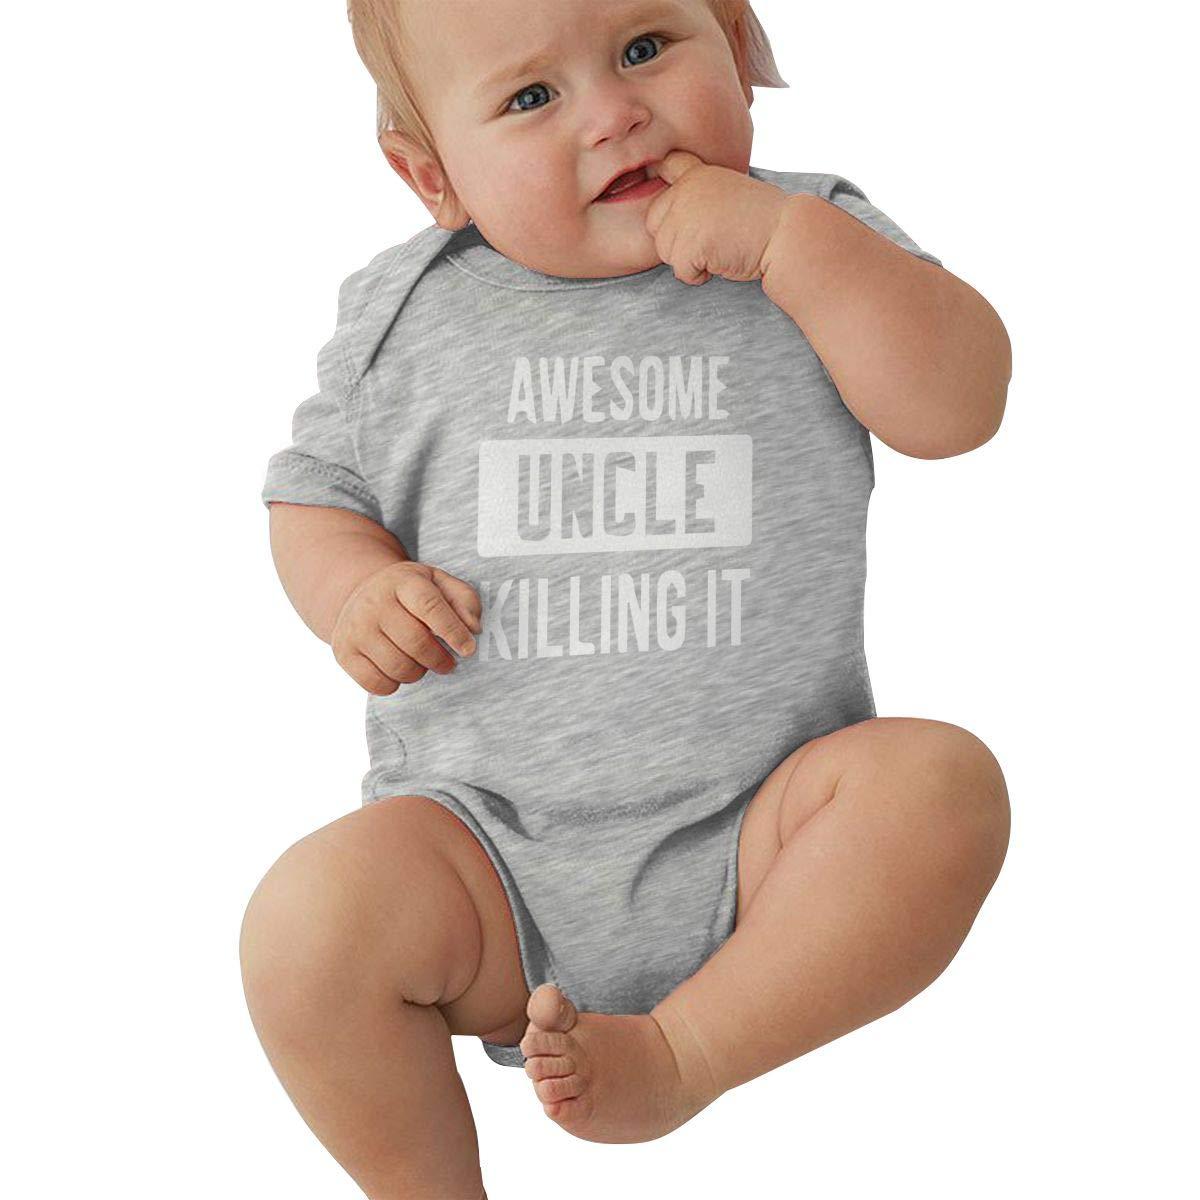 Awesome Uncle Killing It1 Infant Baby Girl Boy Bodysuit Jumpsuit Short Sleeve Bodysuit Tops Clothes